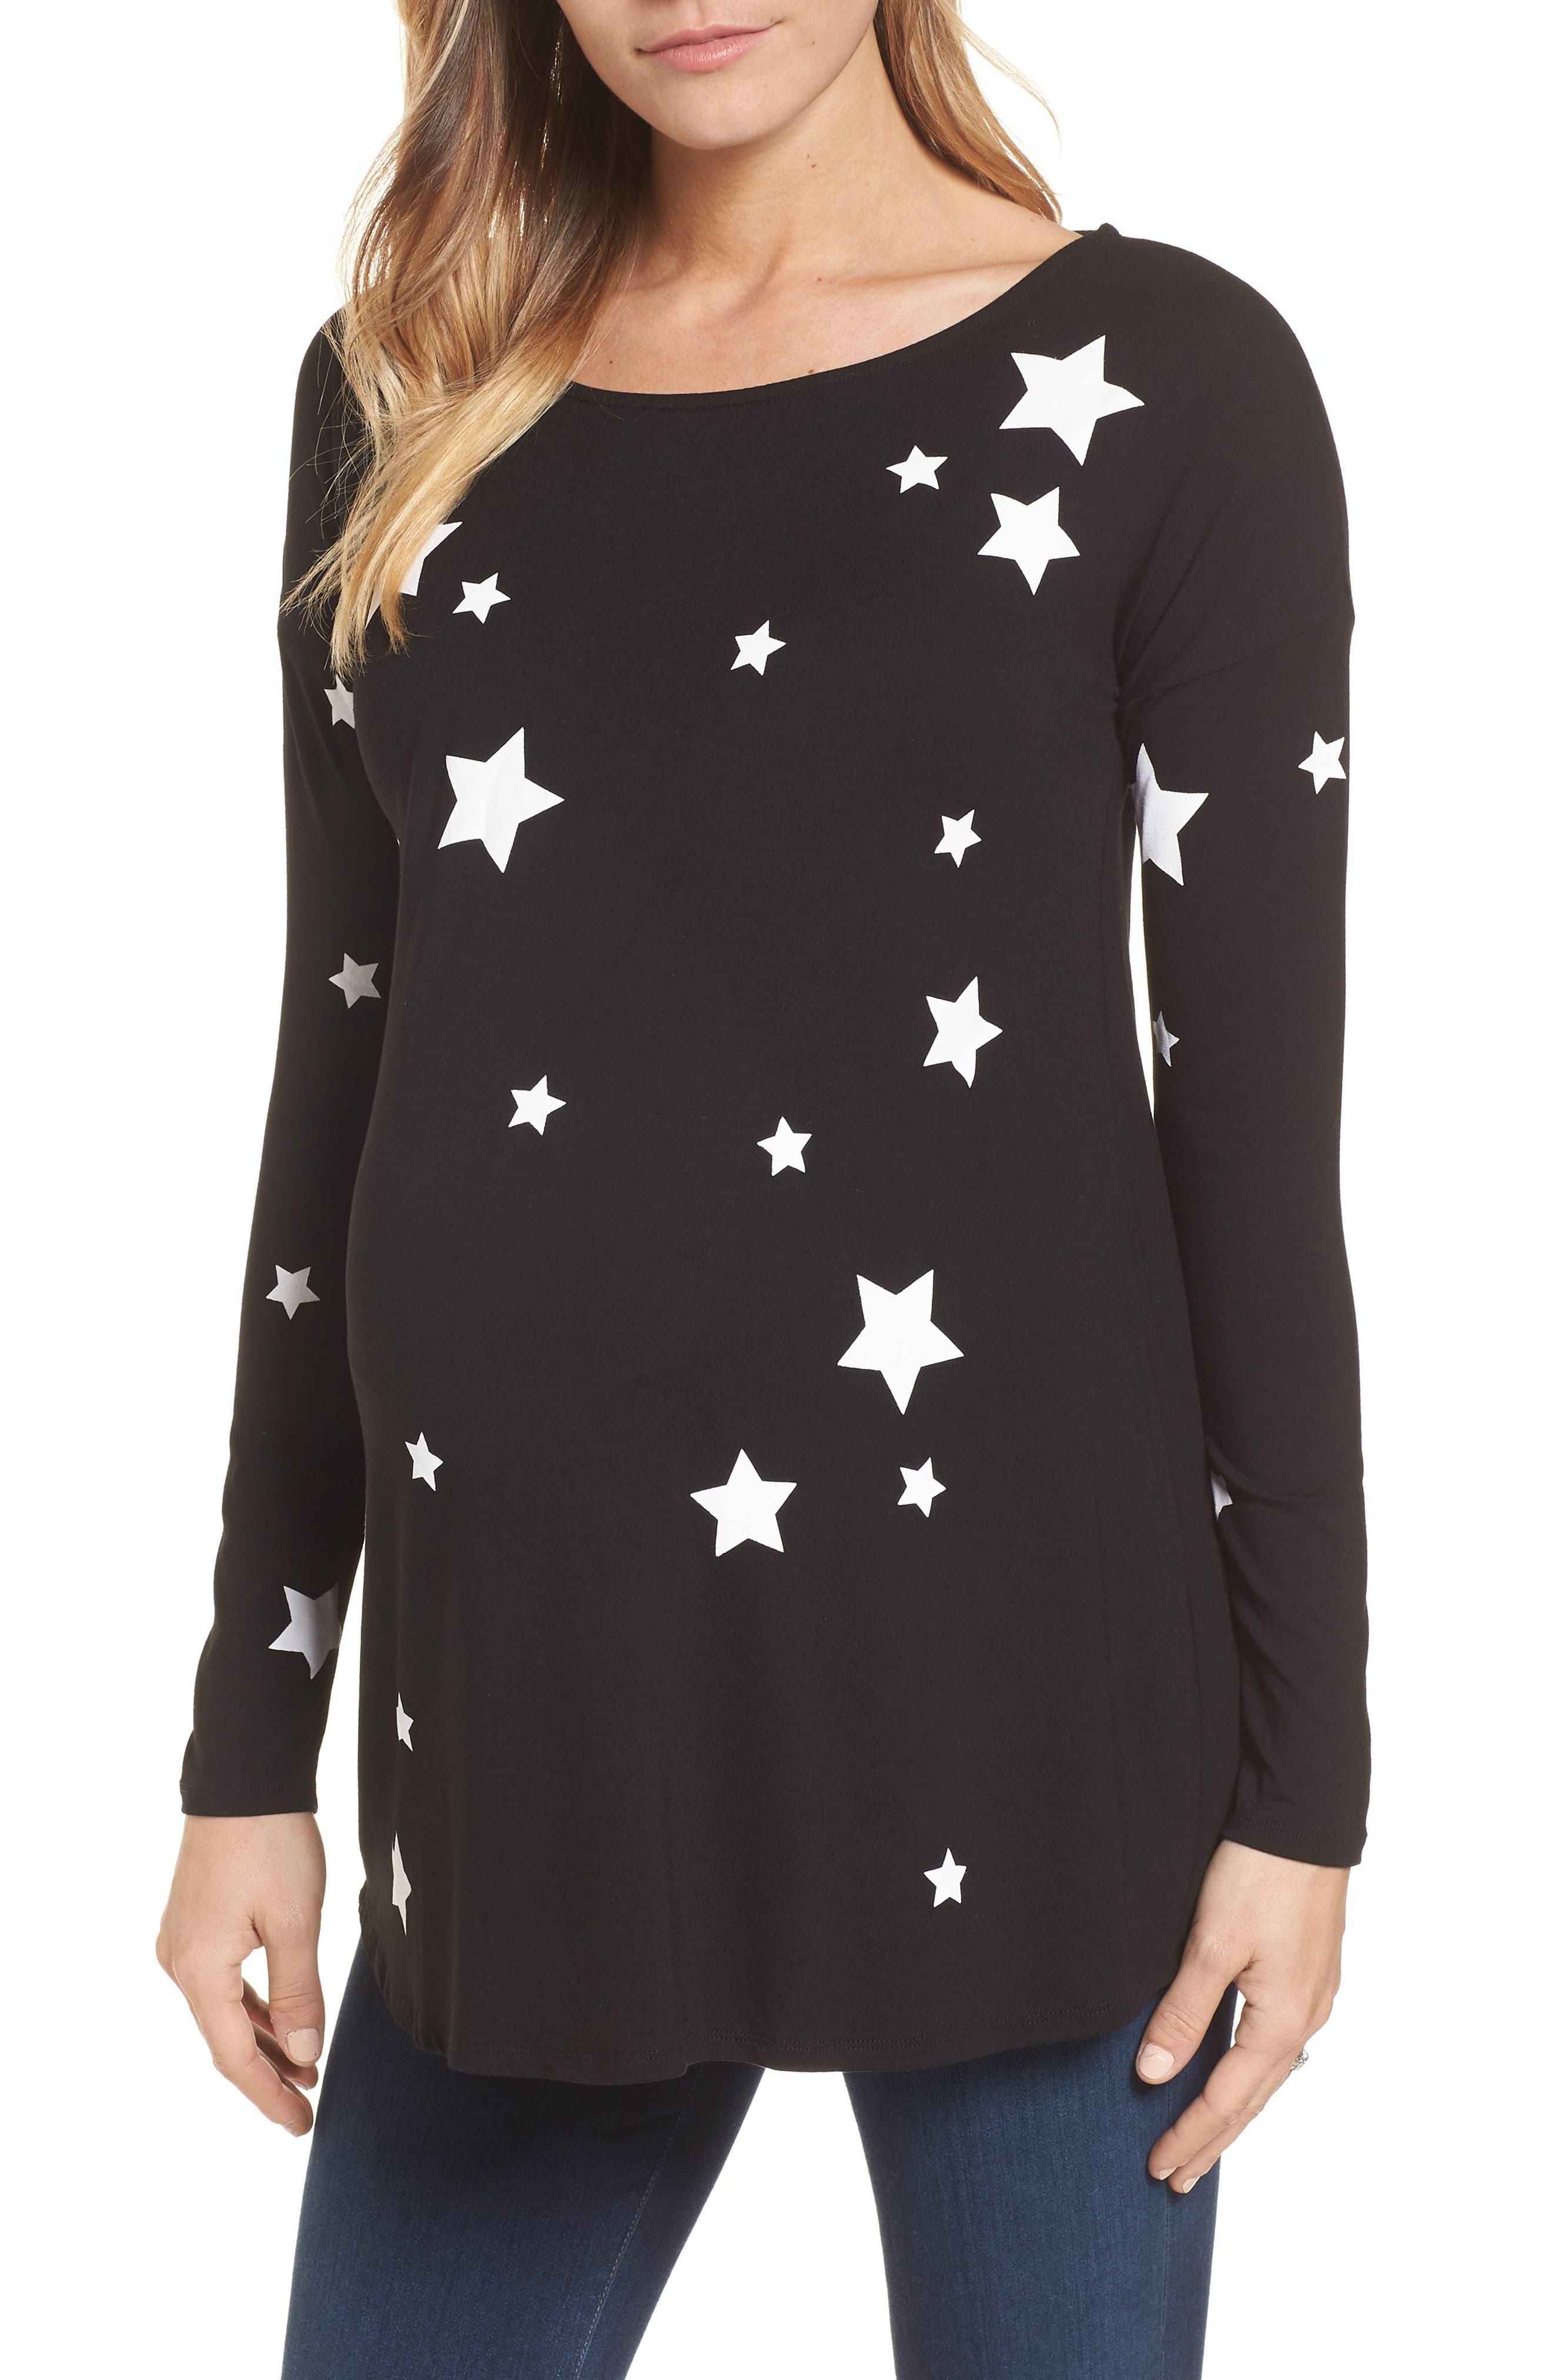 Rosie Maternity Tee,                             Main thumbnail 1, color,                             Black/White Stars